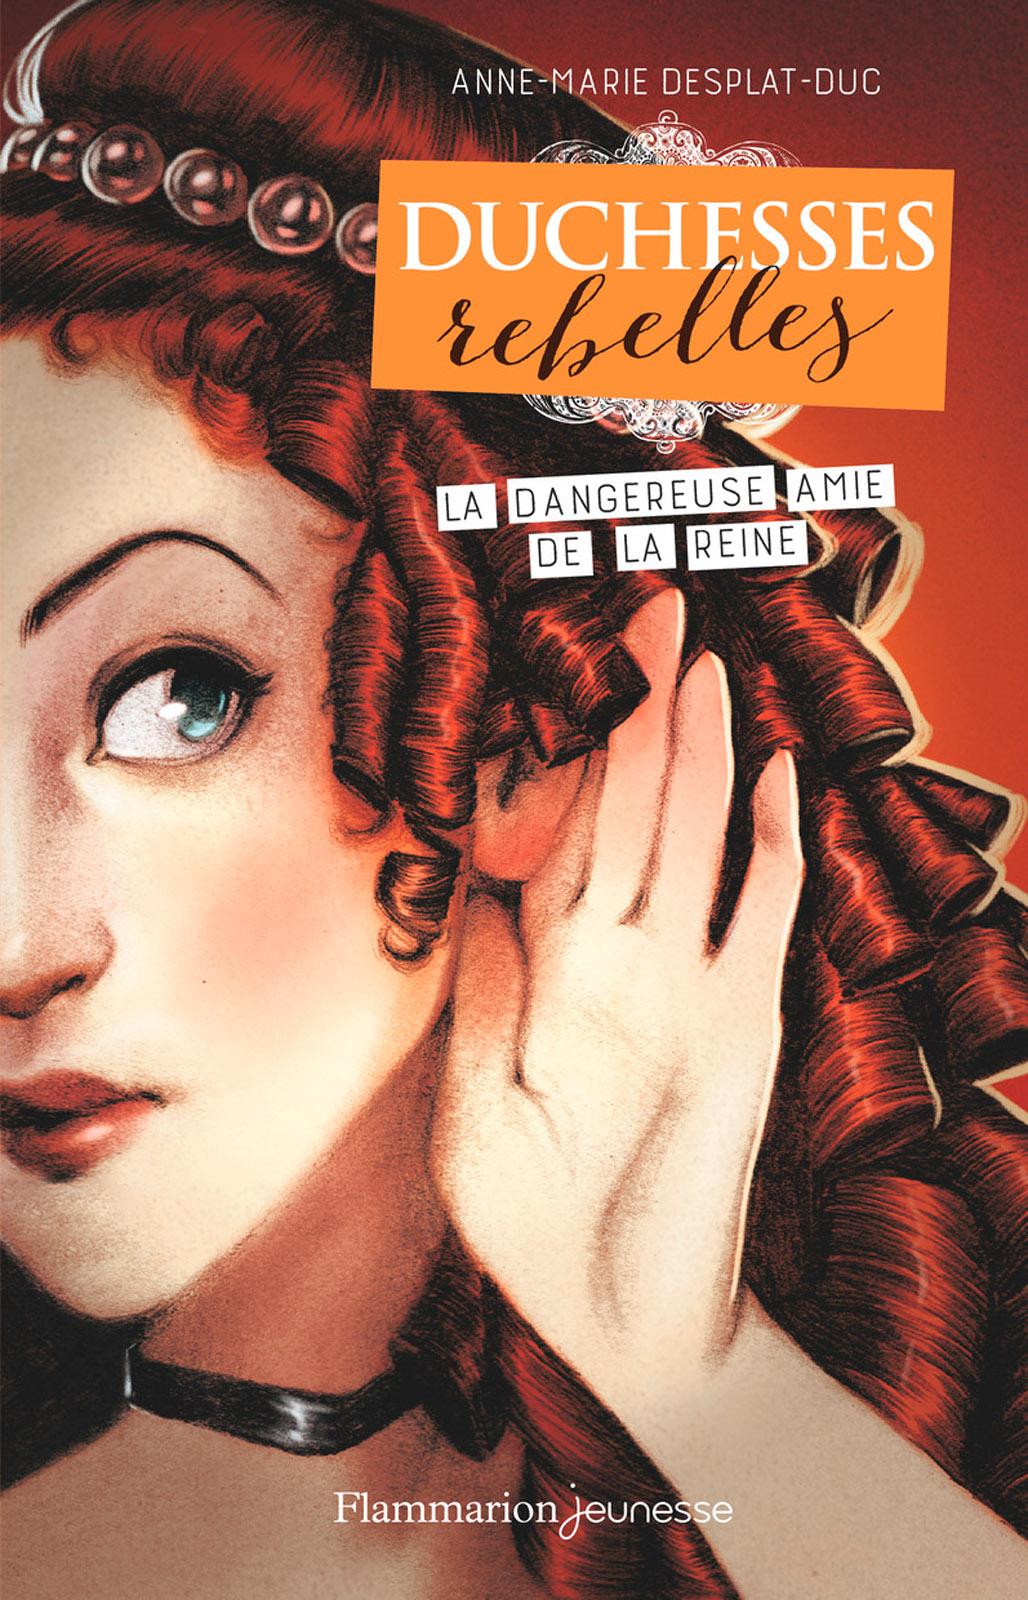 Duchesses rebelles (Tome 2)...